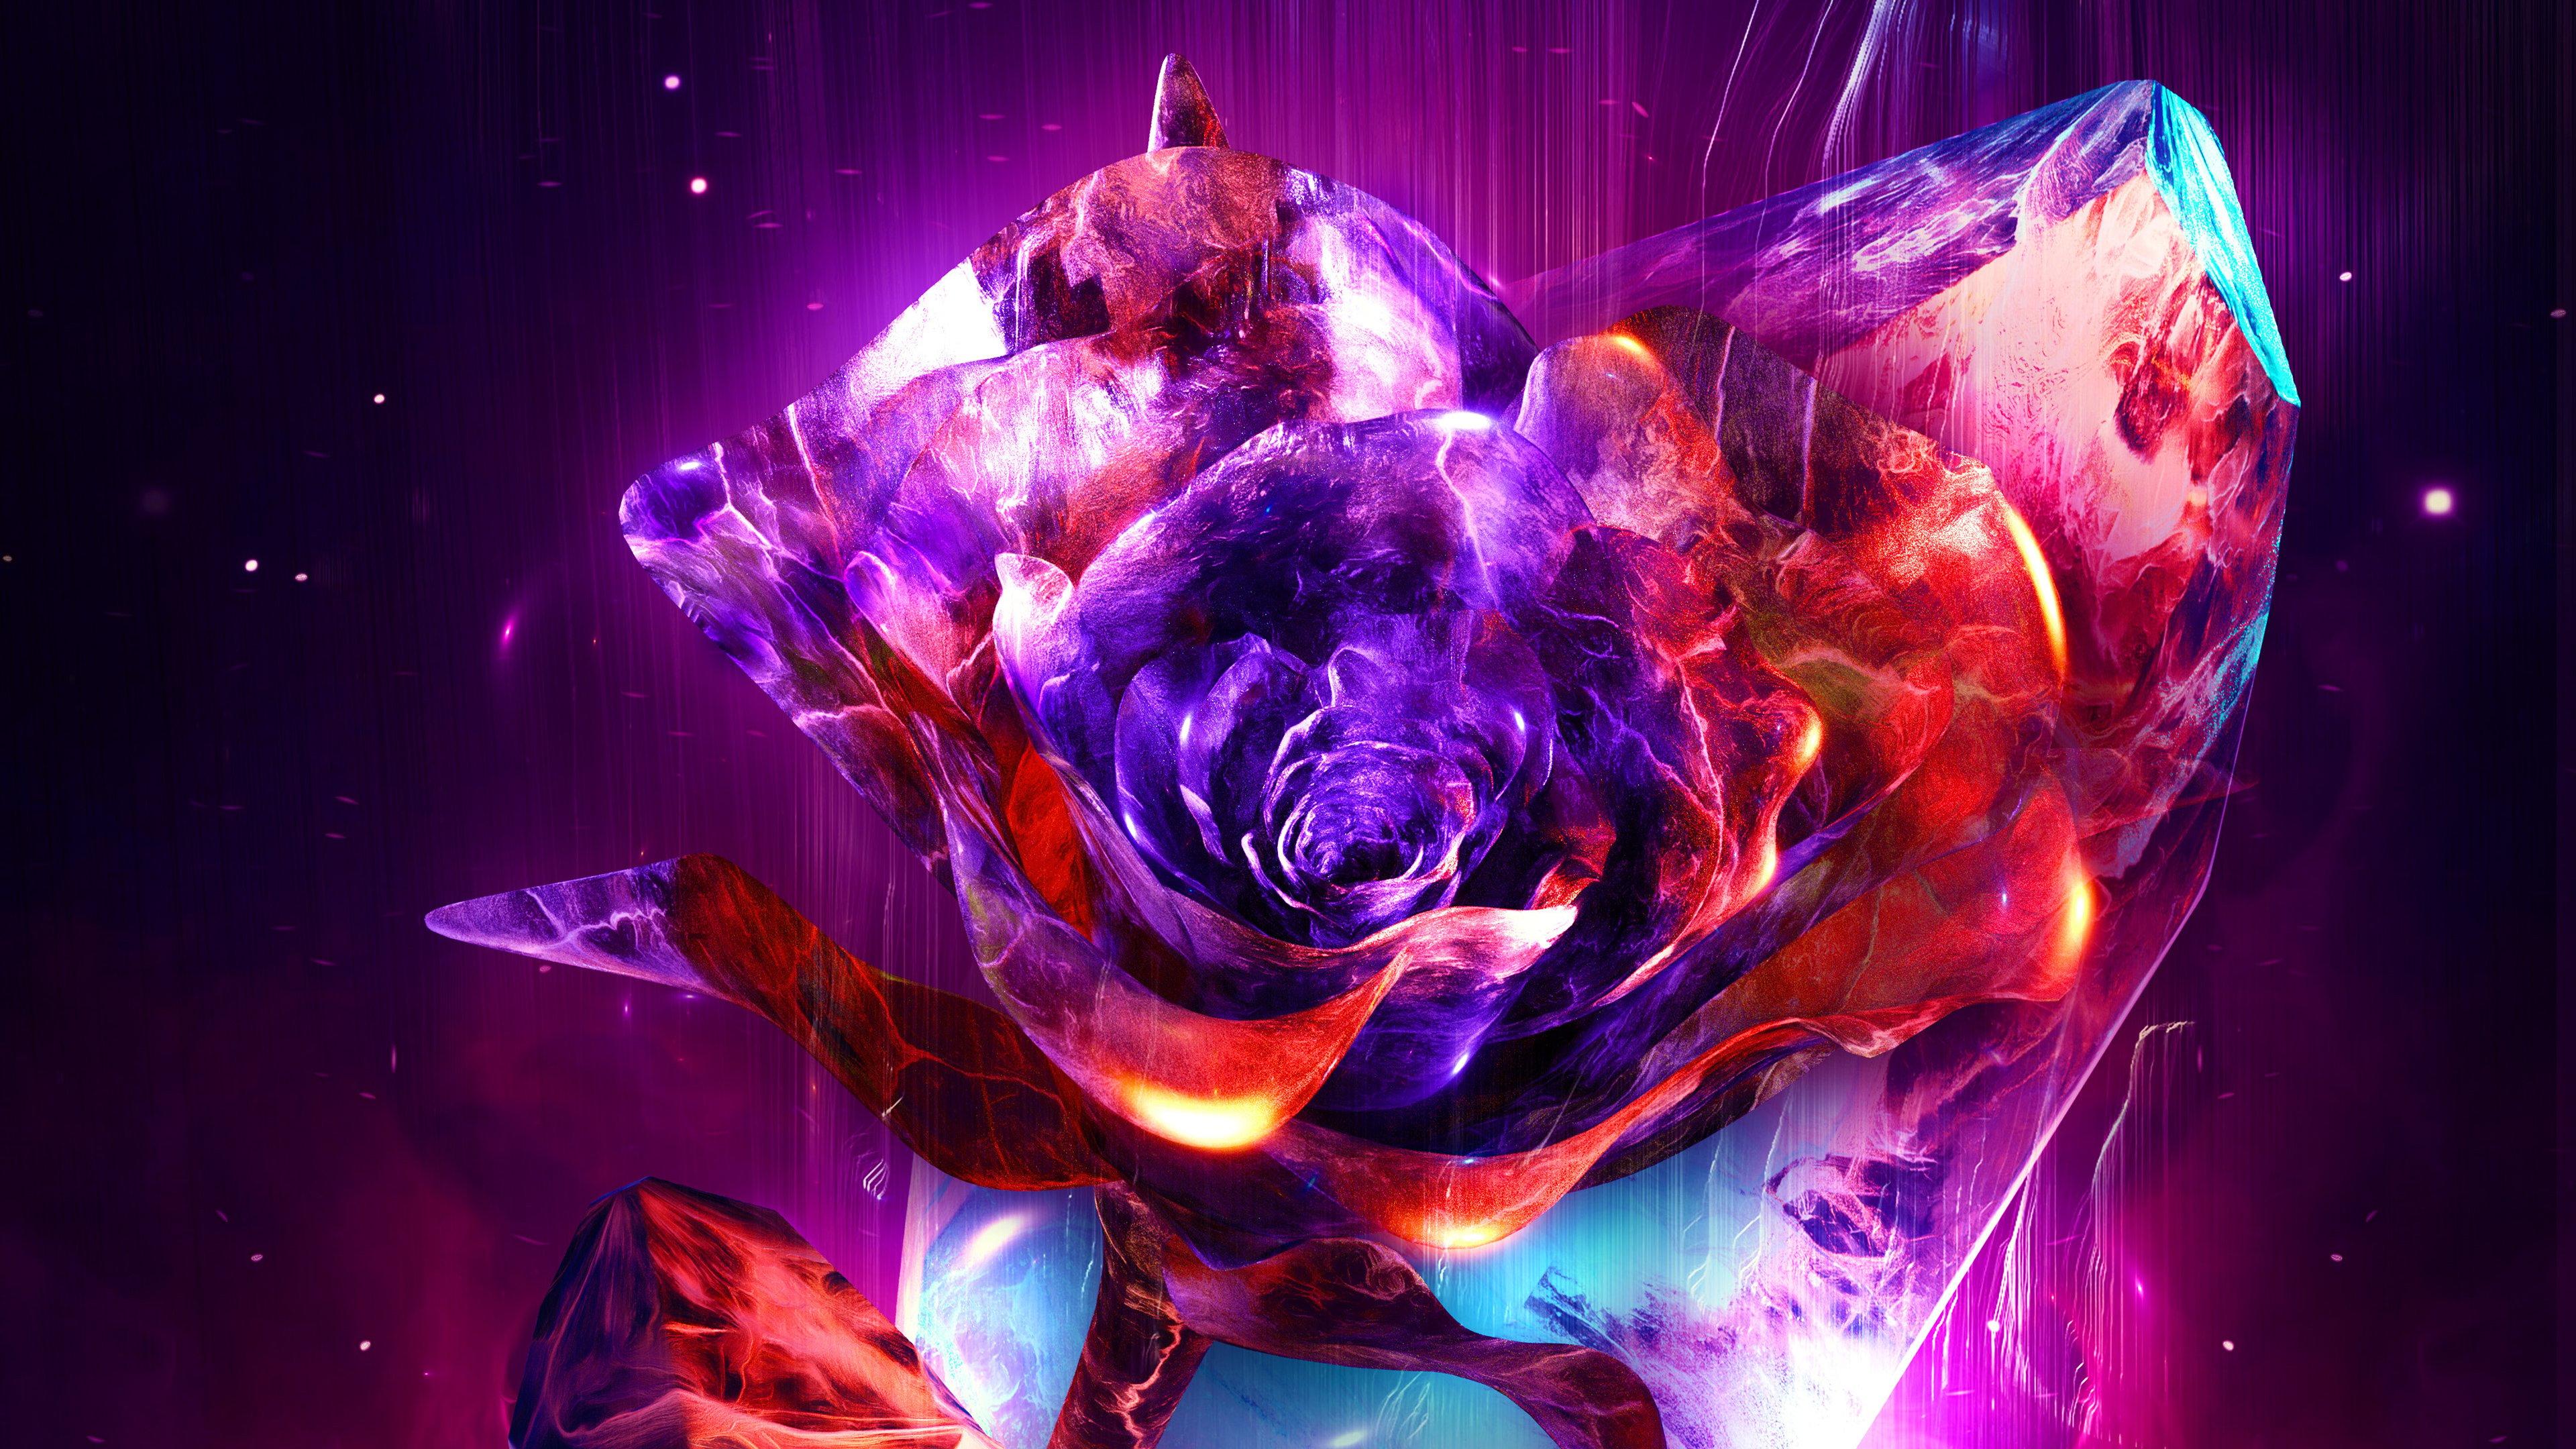 fire abstract Wallpaper 4k Ultra HD ID:4914